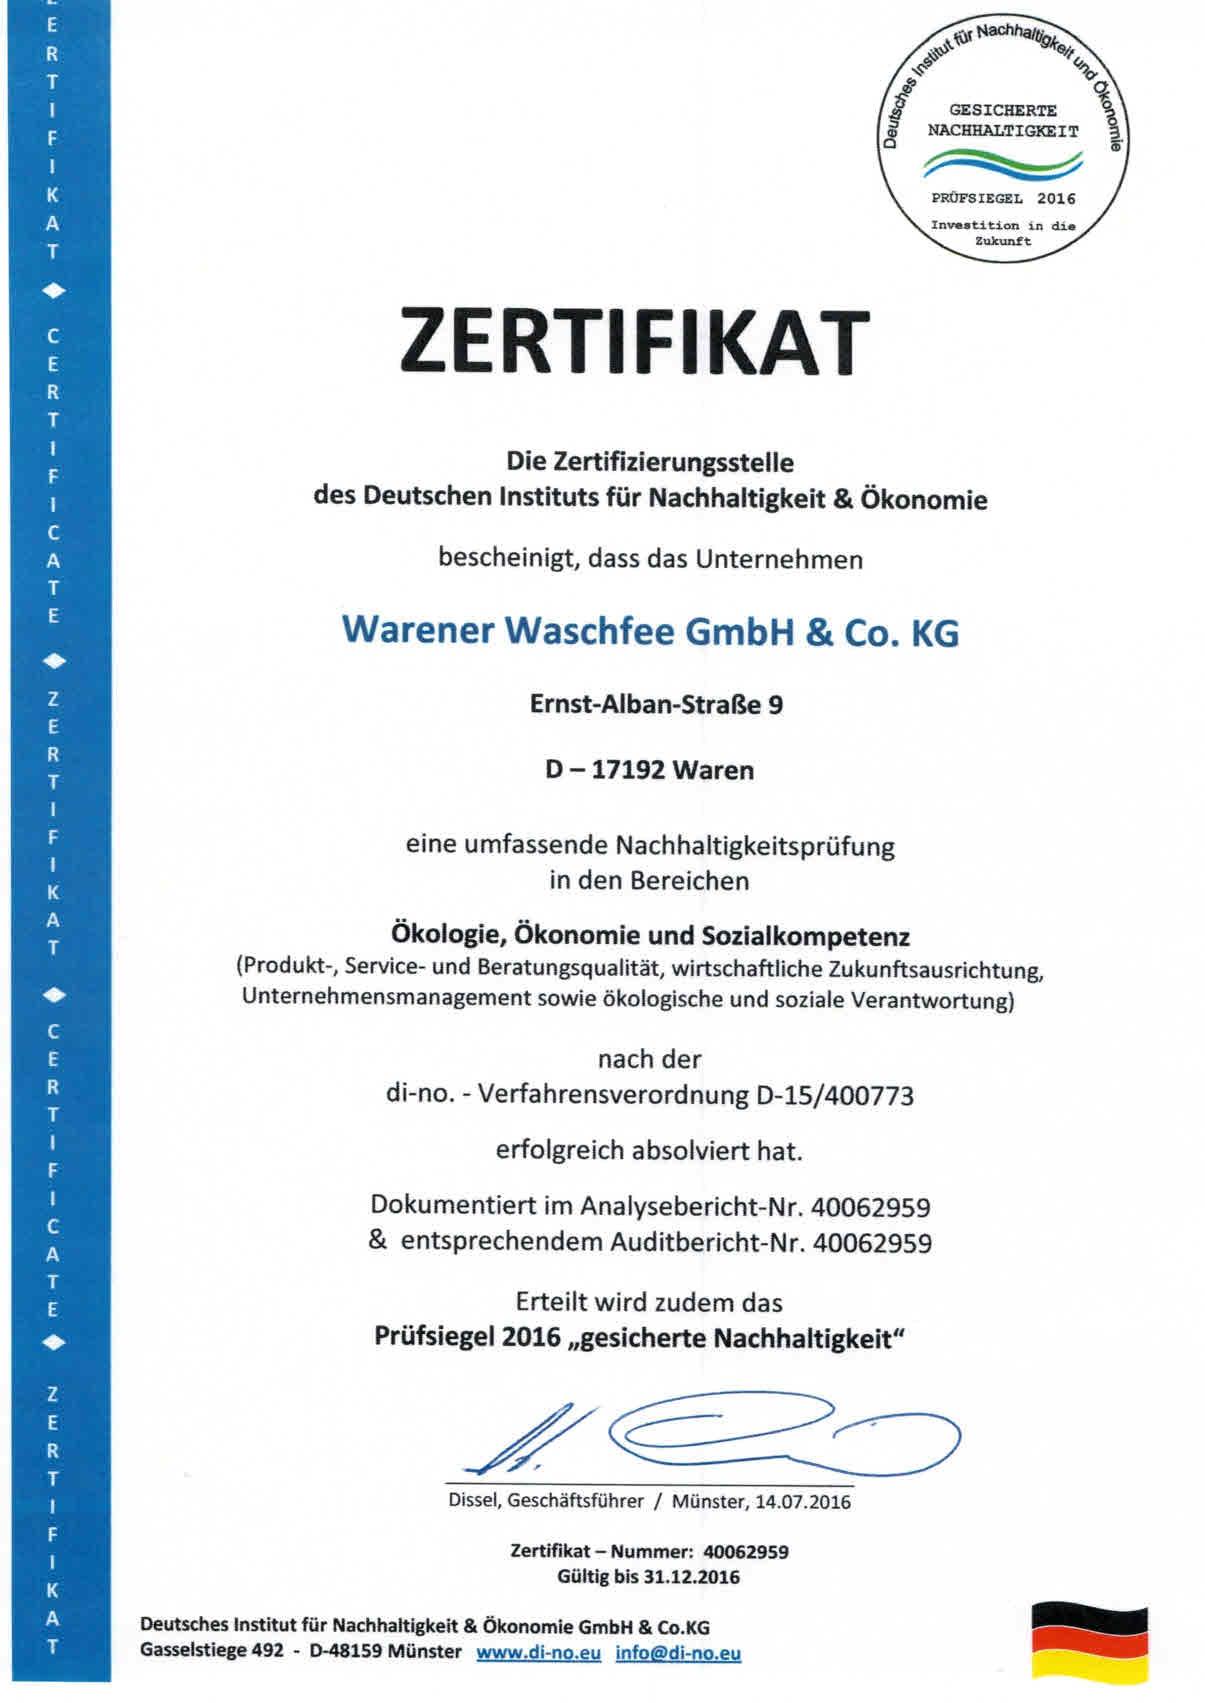 Zertifikat_19072016